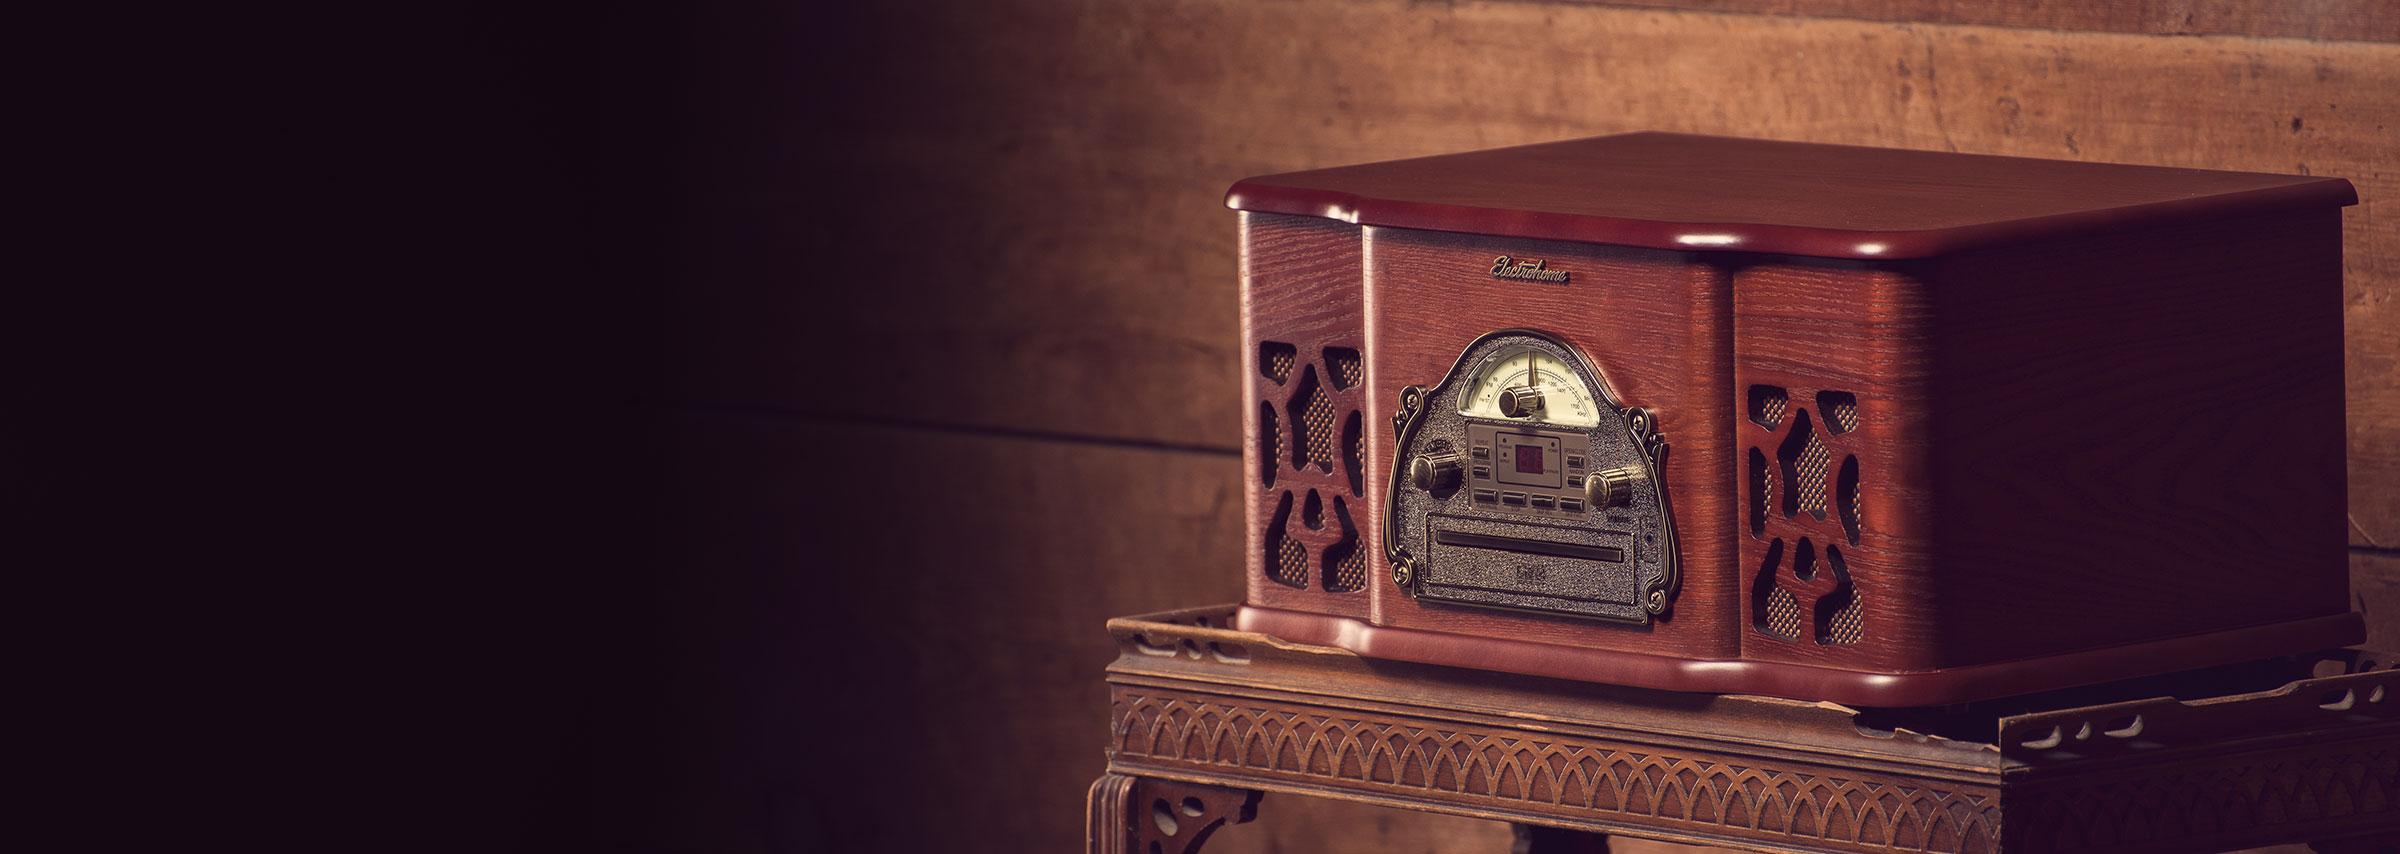 Winston Music System